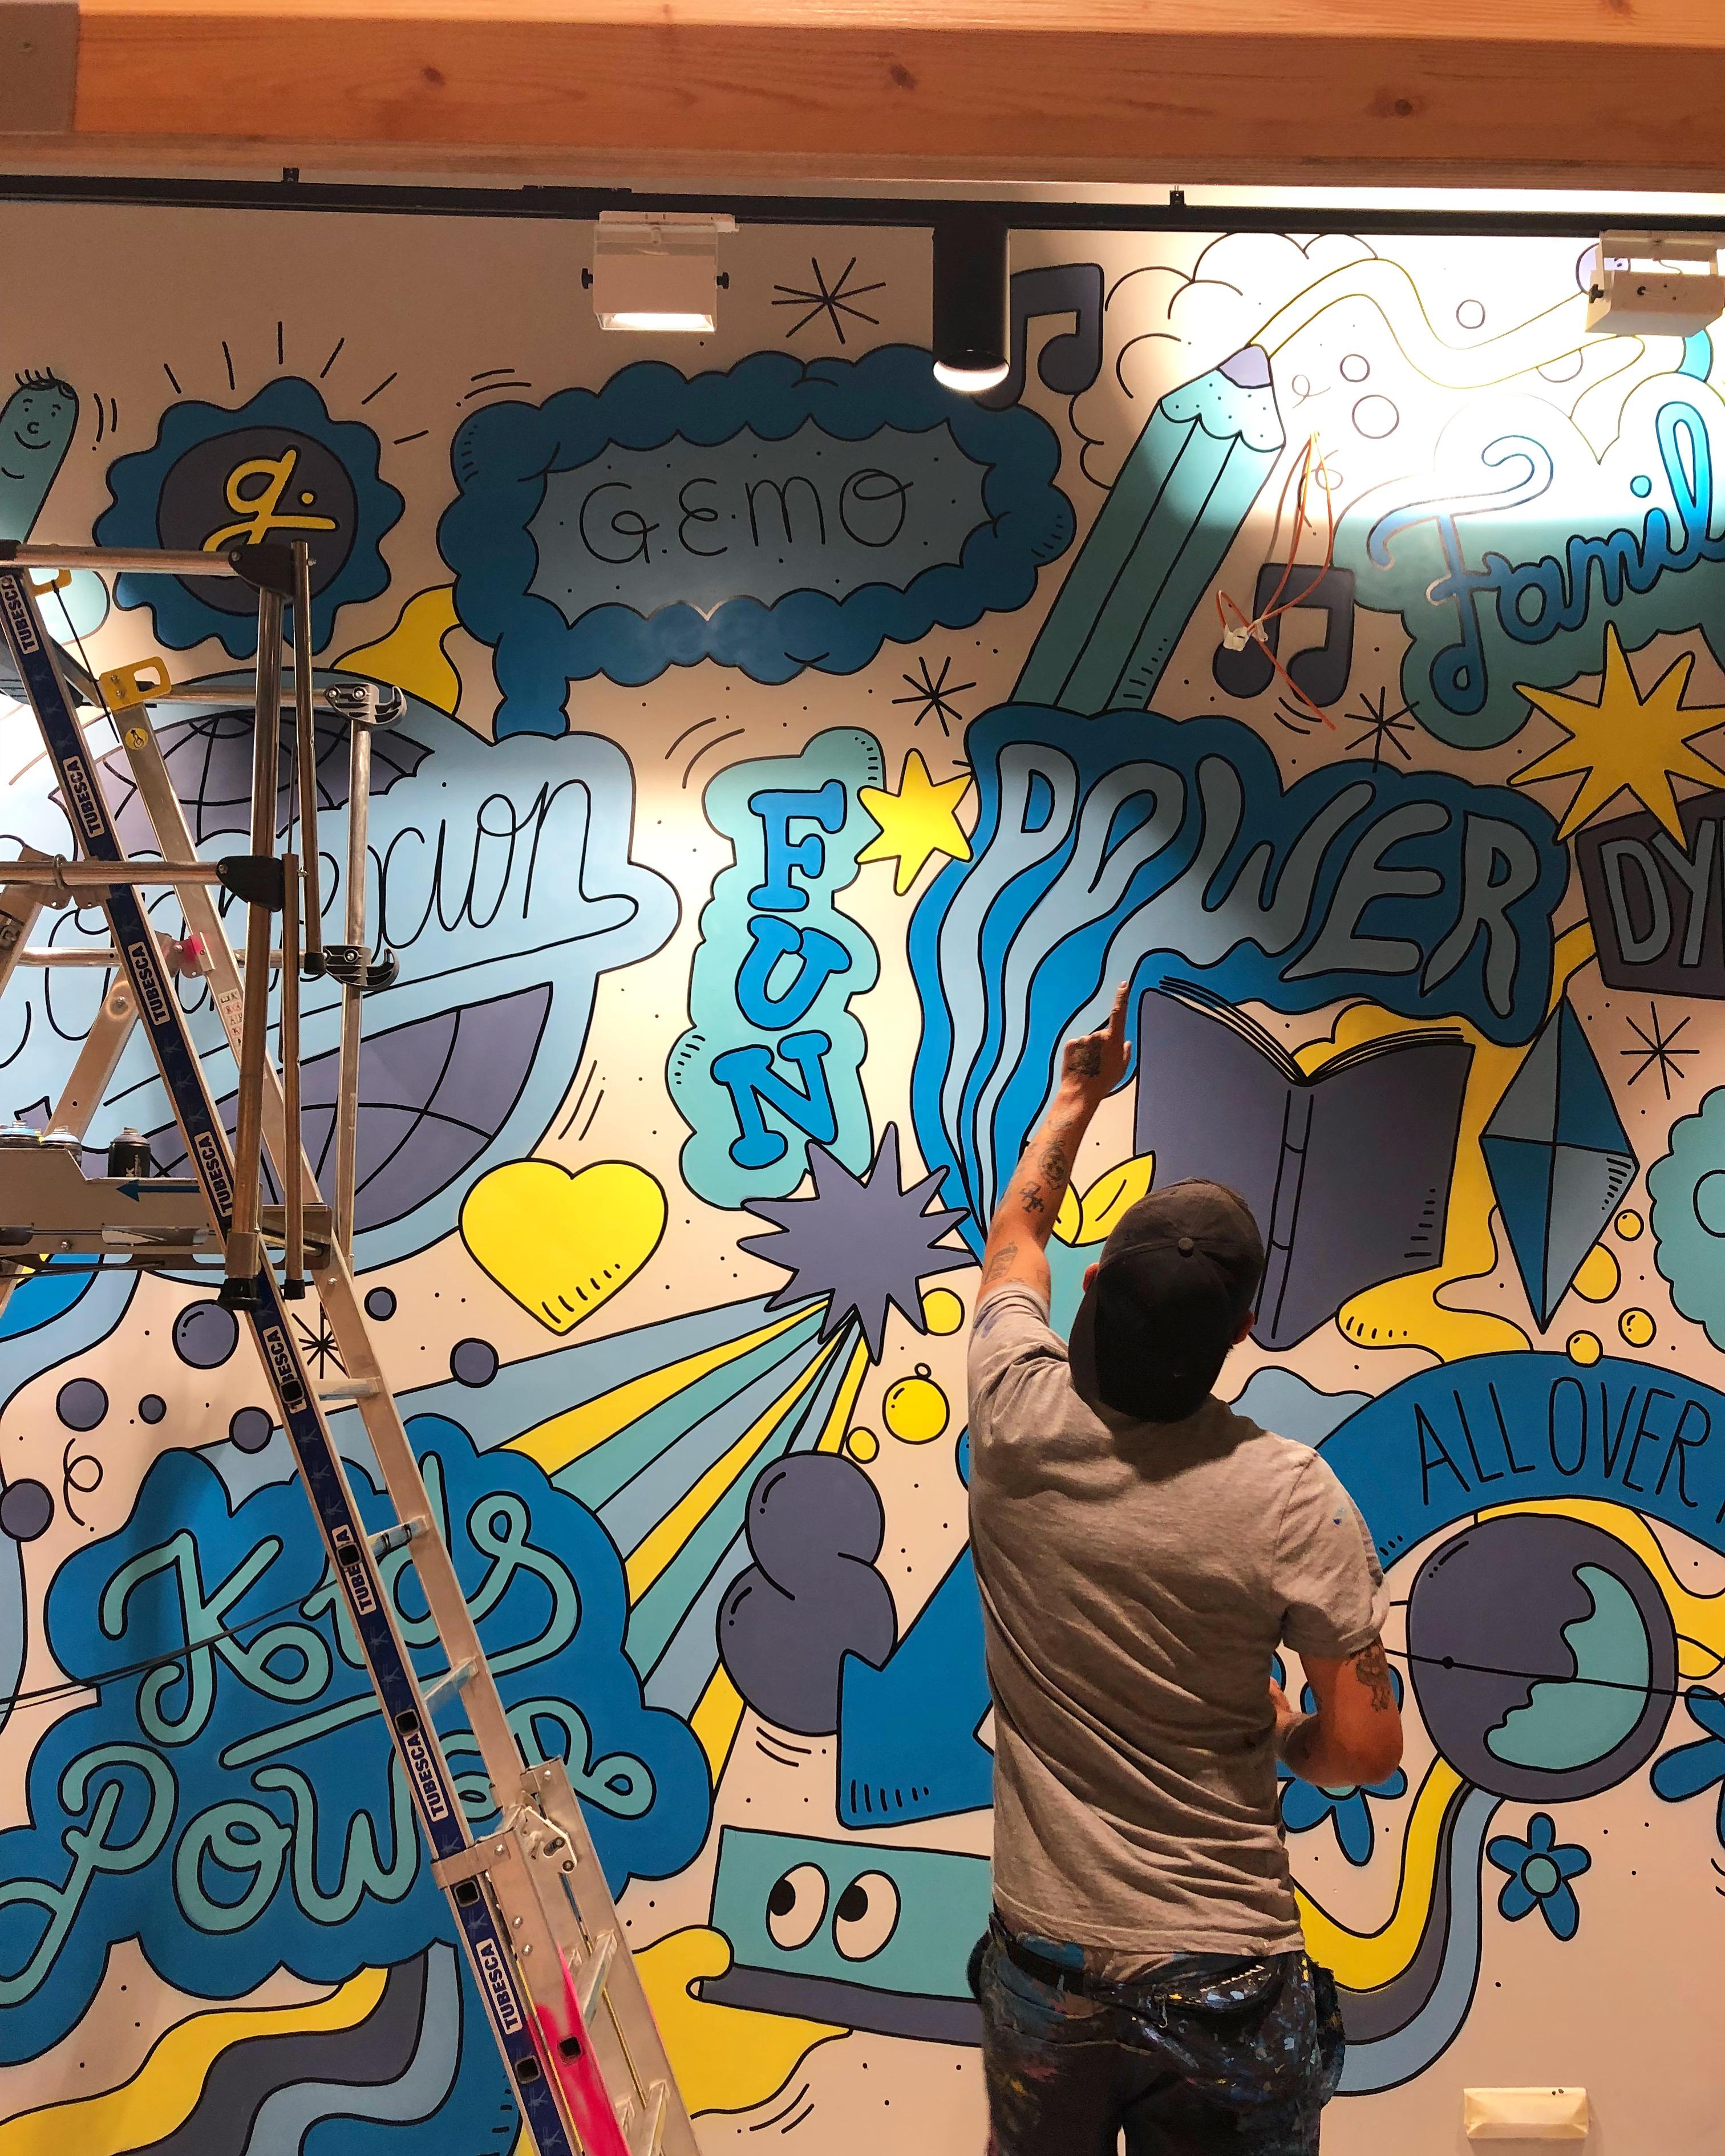 fresque mural realisée en graffiti